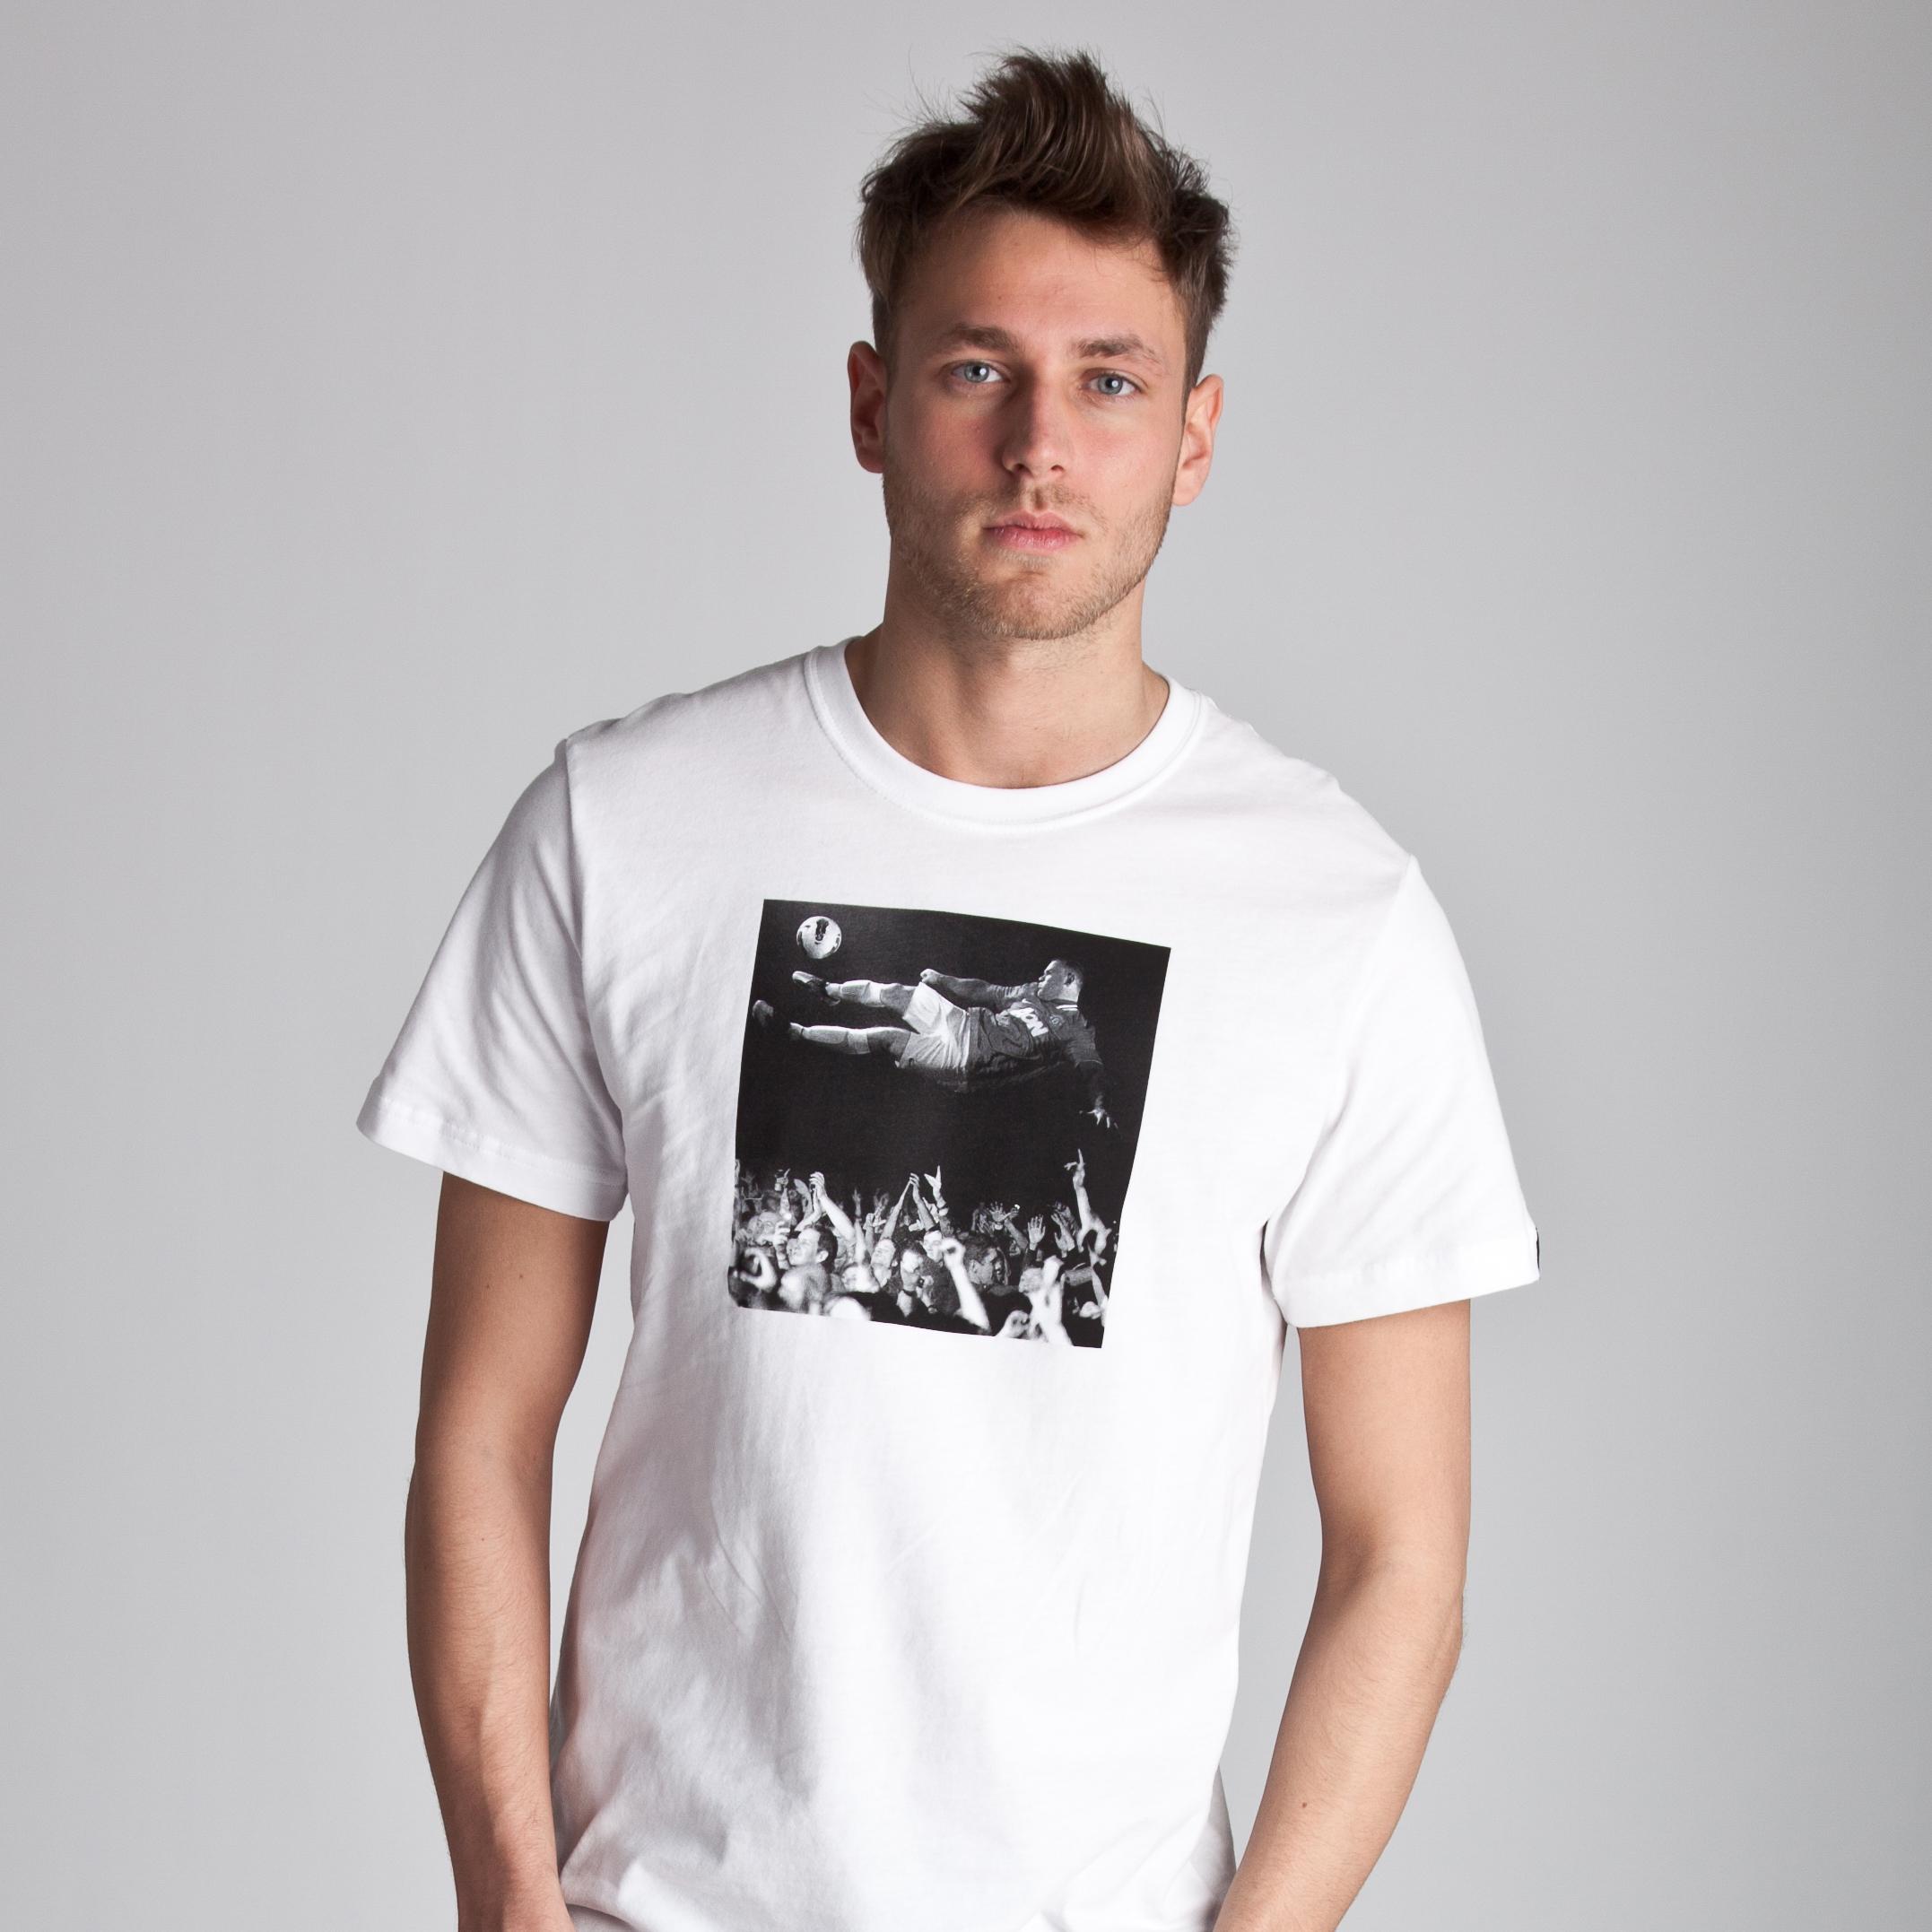 Manchester United Authentic T-Shirt - White/Pure Platinum